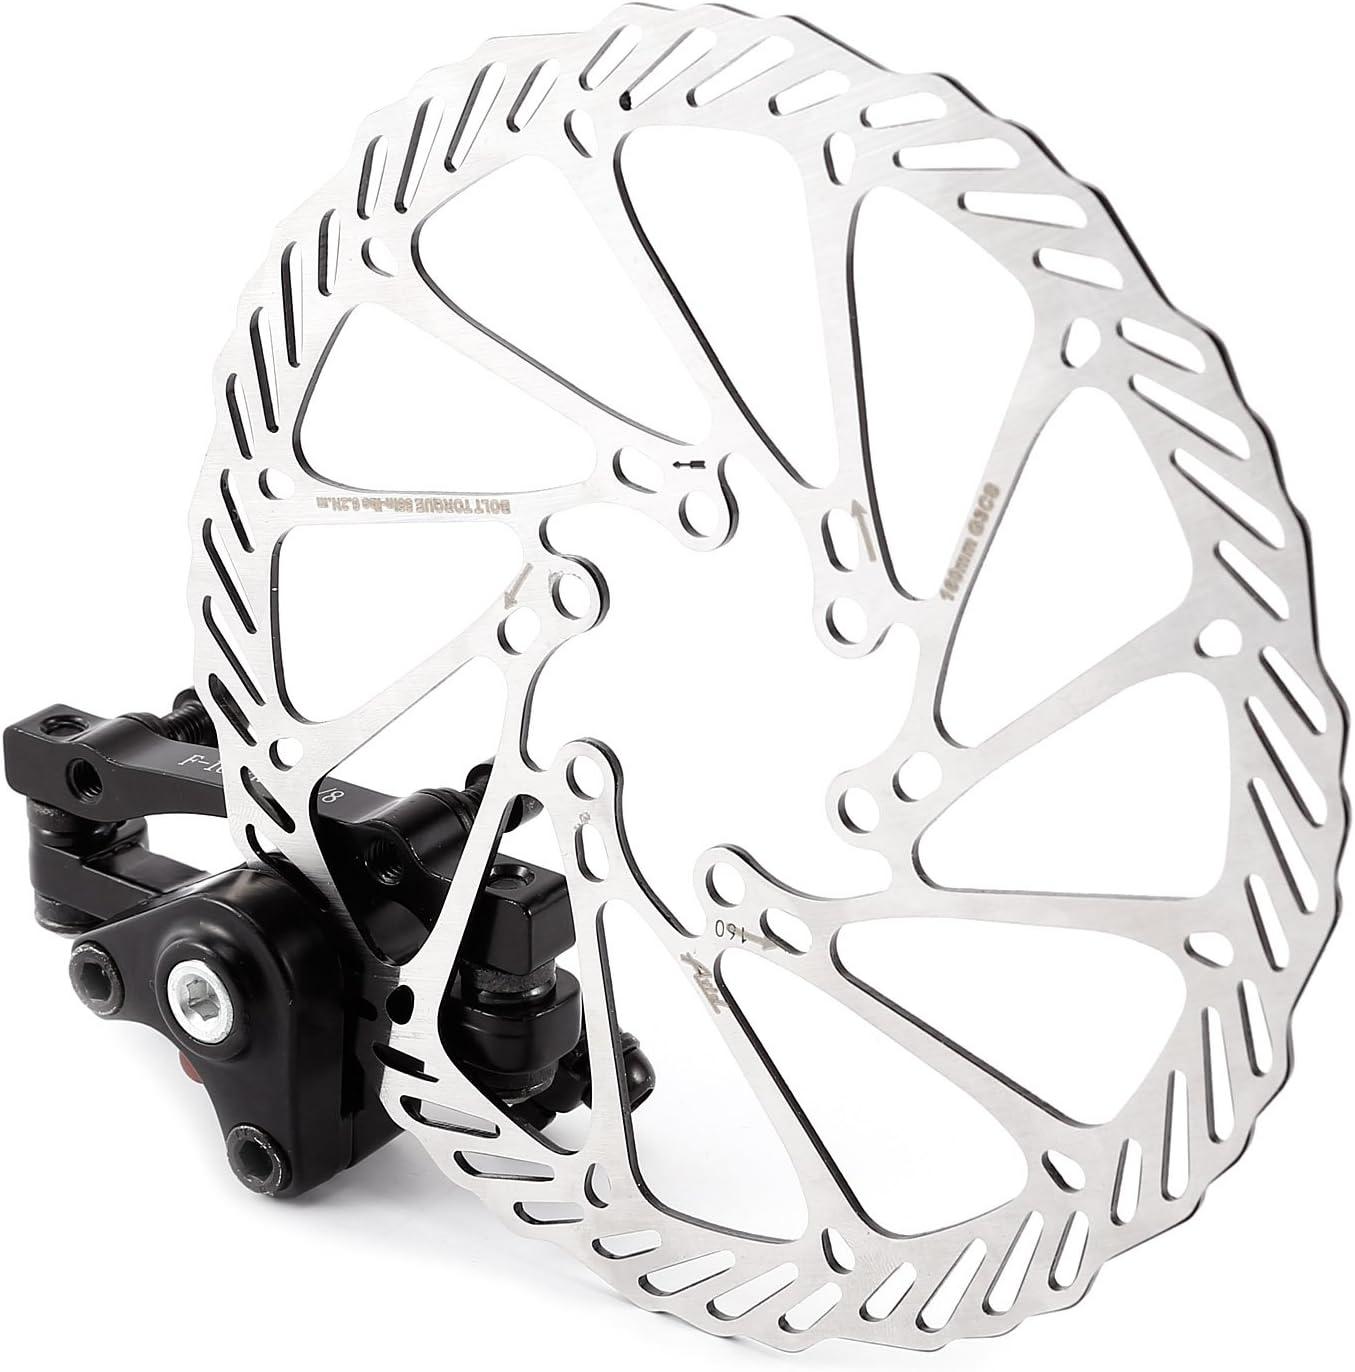 Mountain Bike Bicycle 160mm Rotor Front Rear Mechanical Disc Brake Caliper Kits